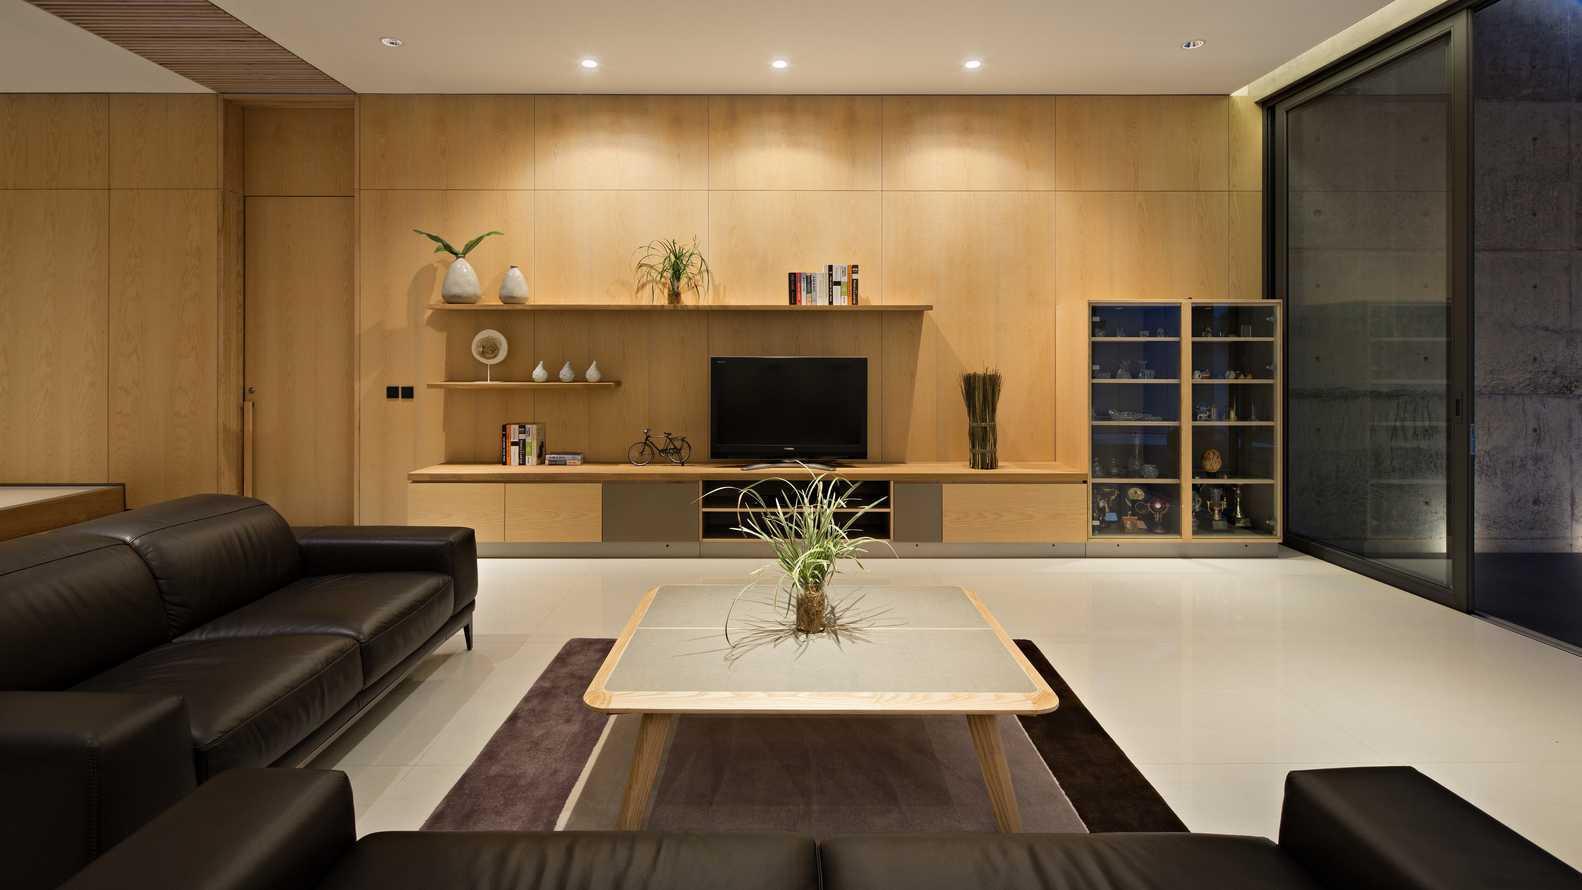 Rak TV minimalis di ruang keluarga minimalis yang nyaman (Sumber: arsitag.com)